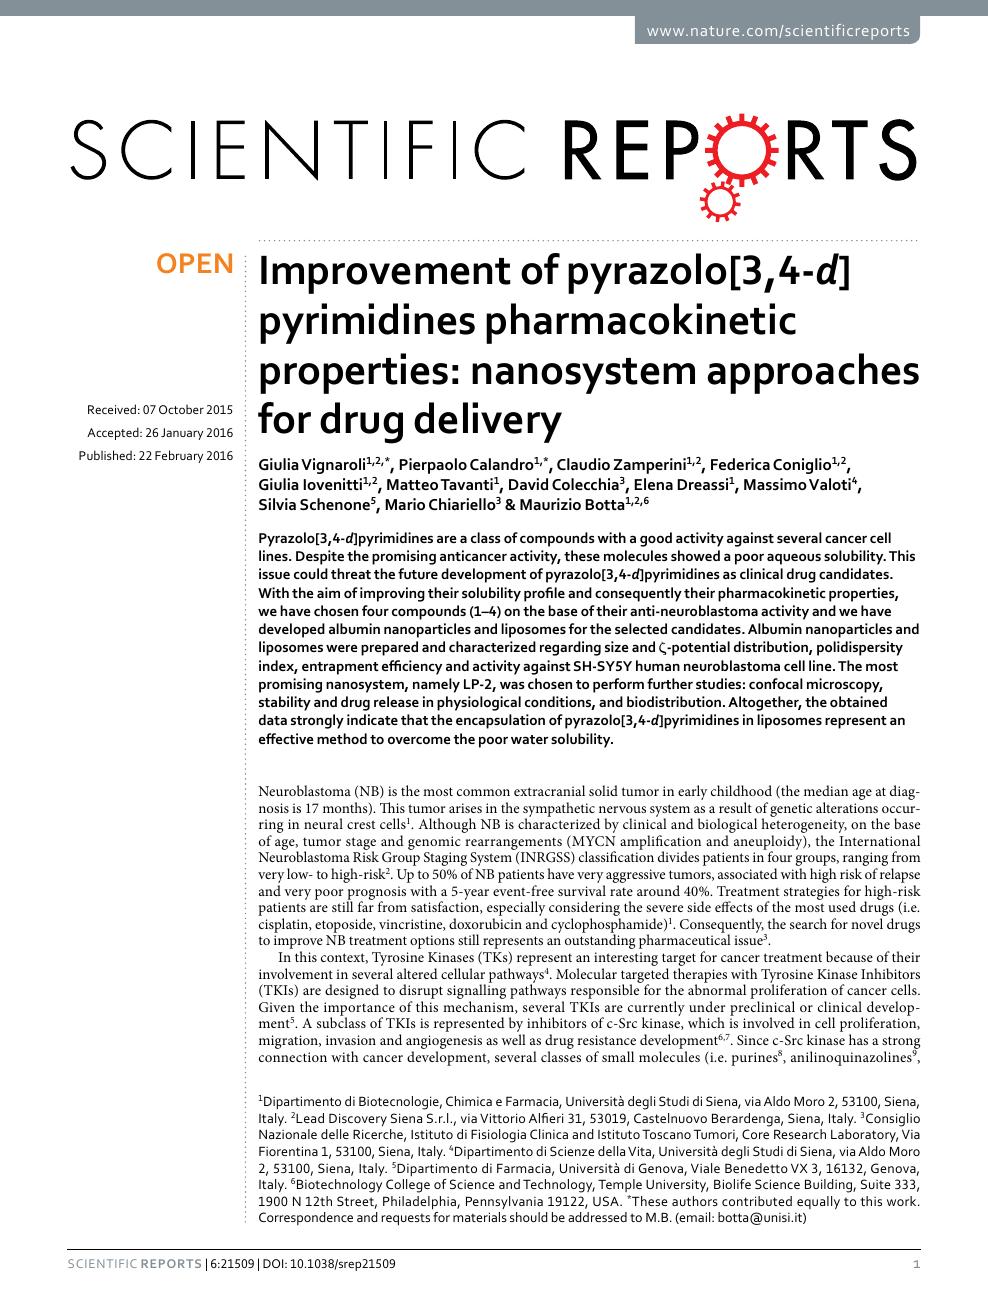 Improvement of pyrazolo[3,4-d]pyrimidines pharmacokinetic properties